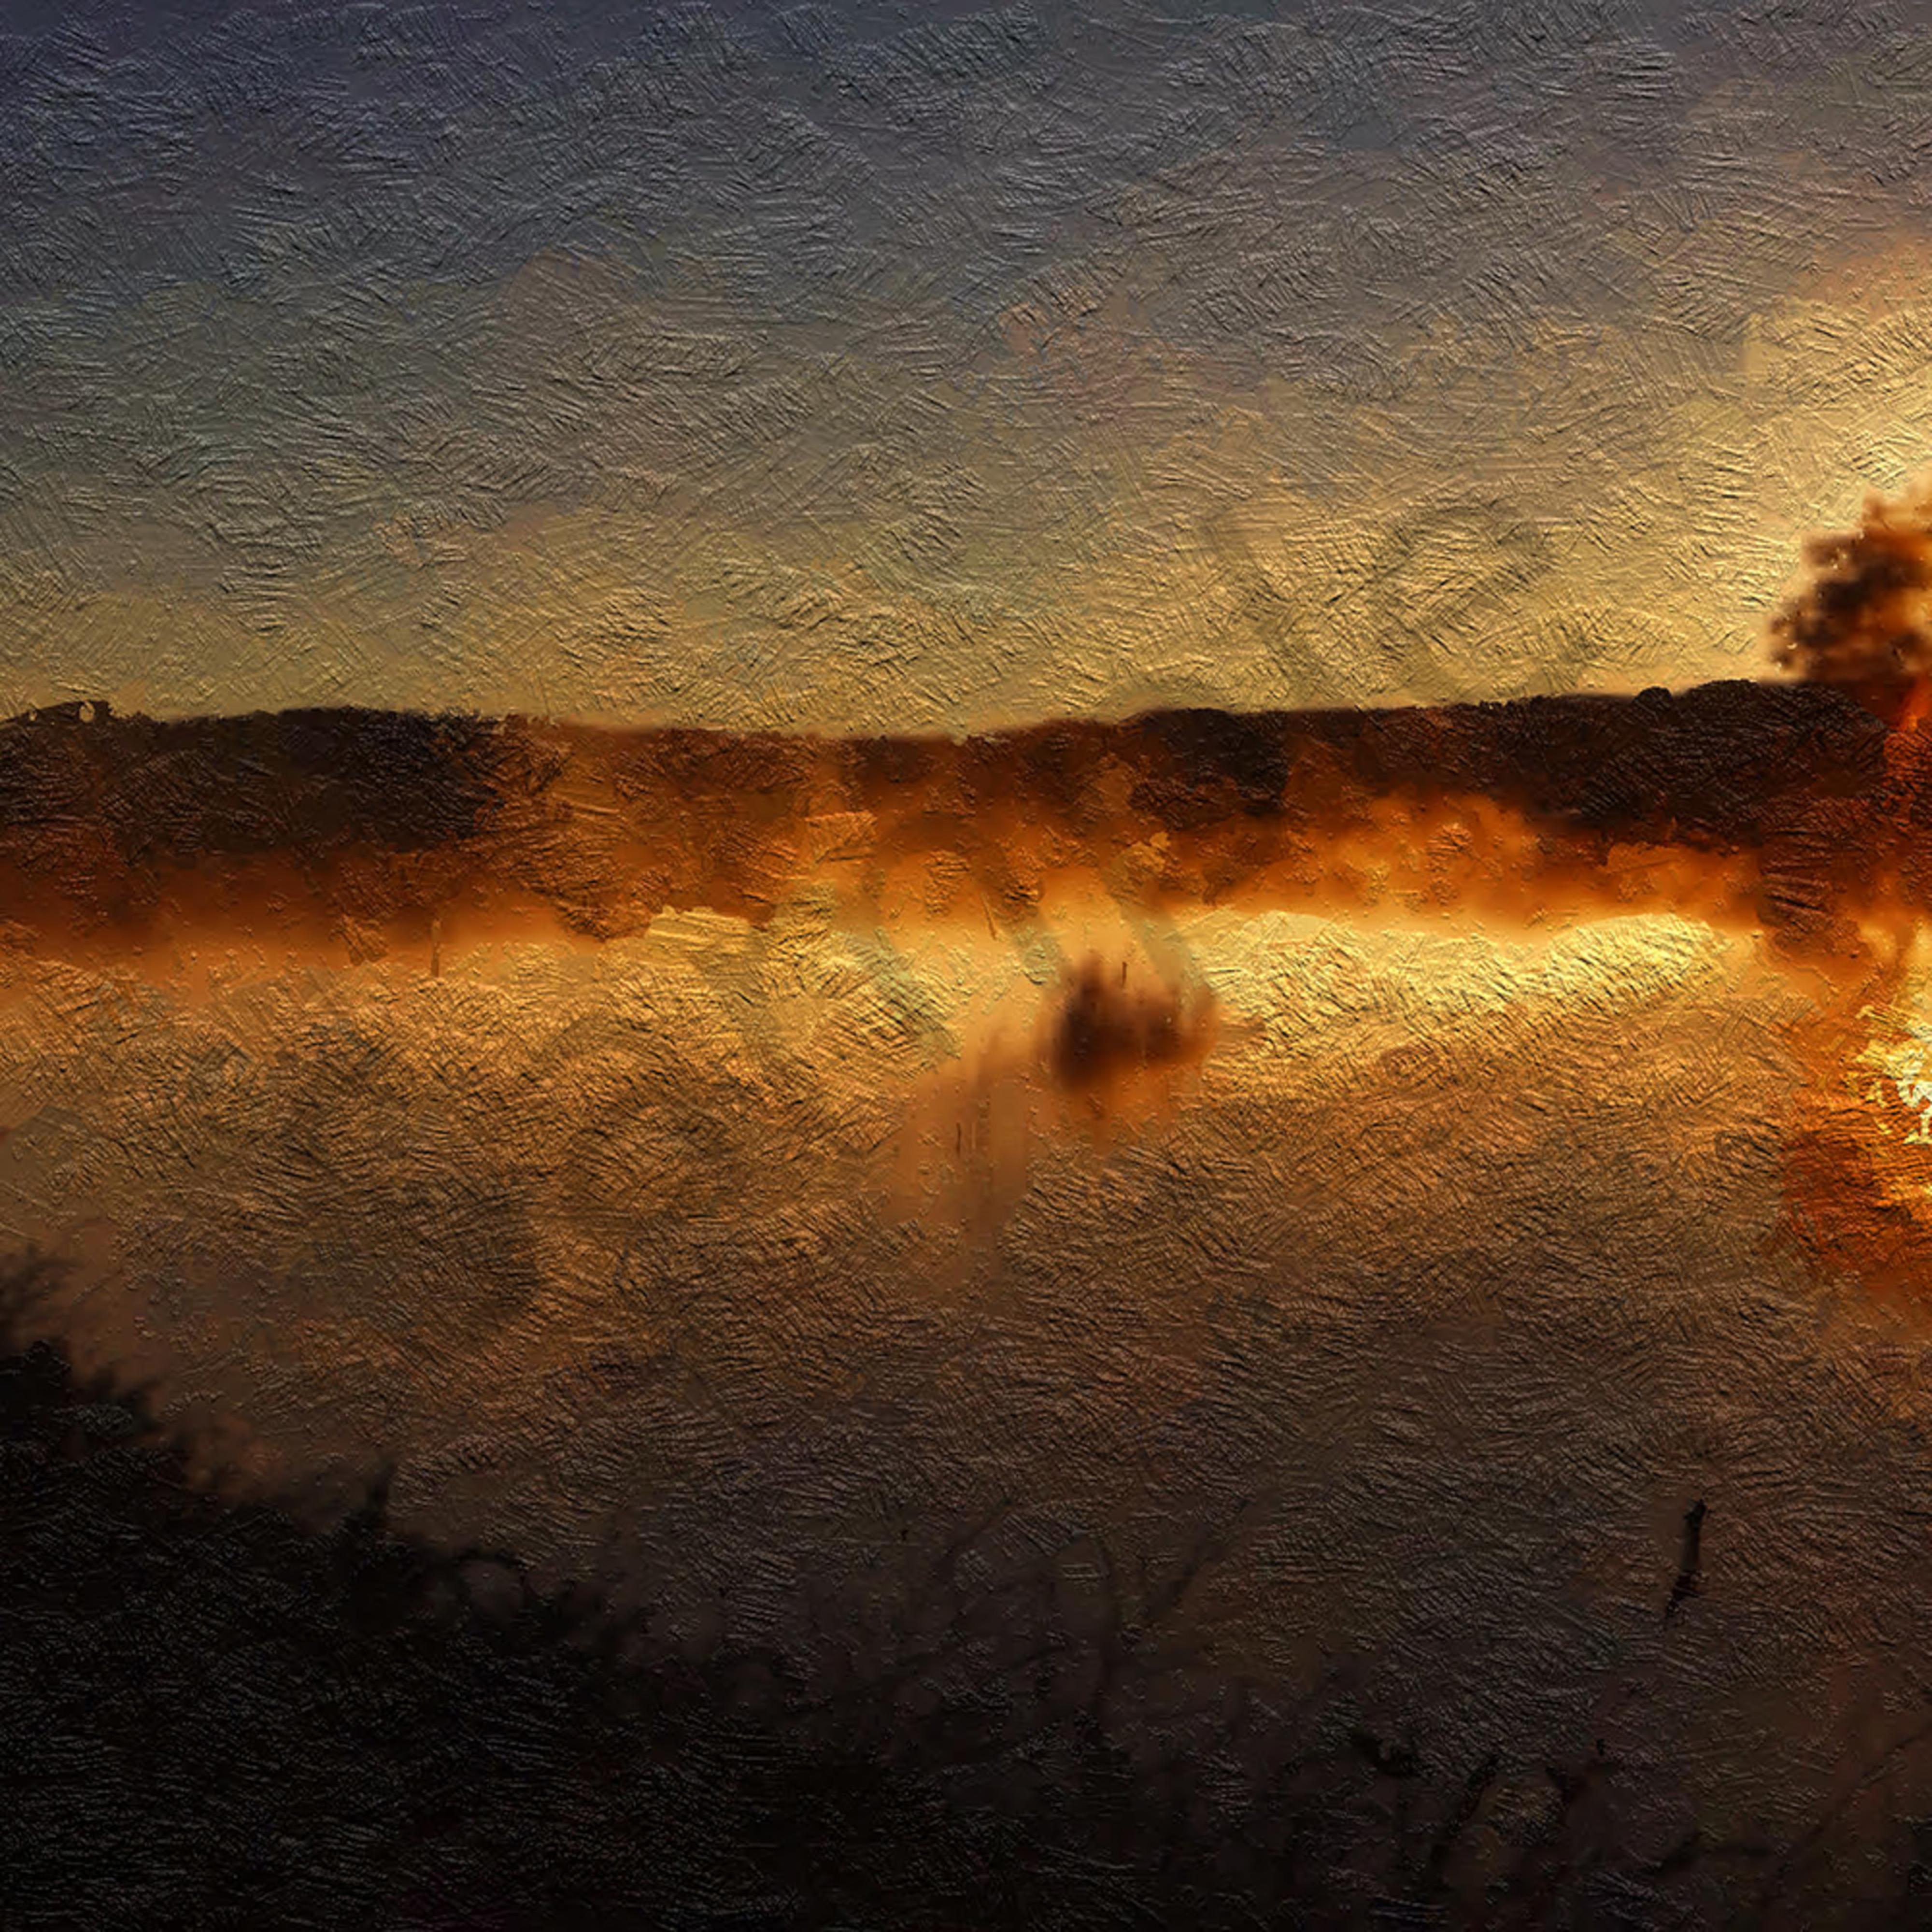 Sunrise pattern ssi6wd